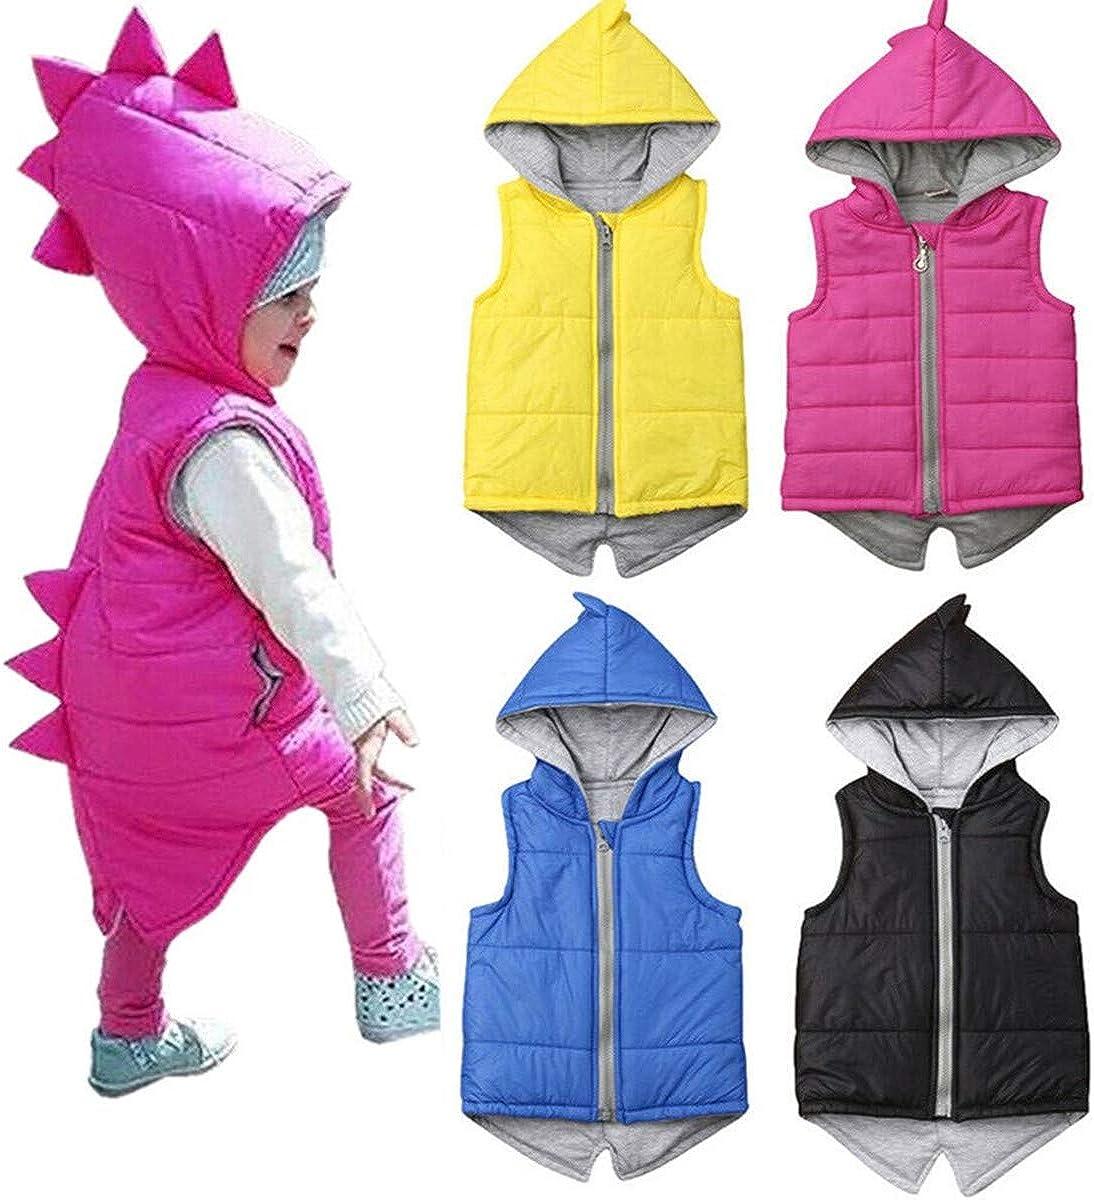 Digirlsor Baby Toddler Boys Girls Outerwear Winter Vests Kids Stand Collar Corduroy Warm Sleeveless Jacket Waistcoat,1-8Y